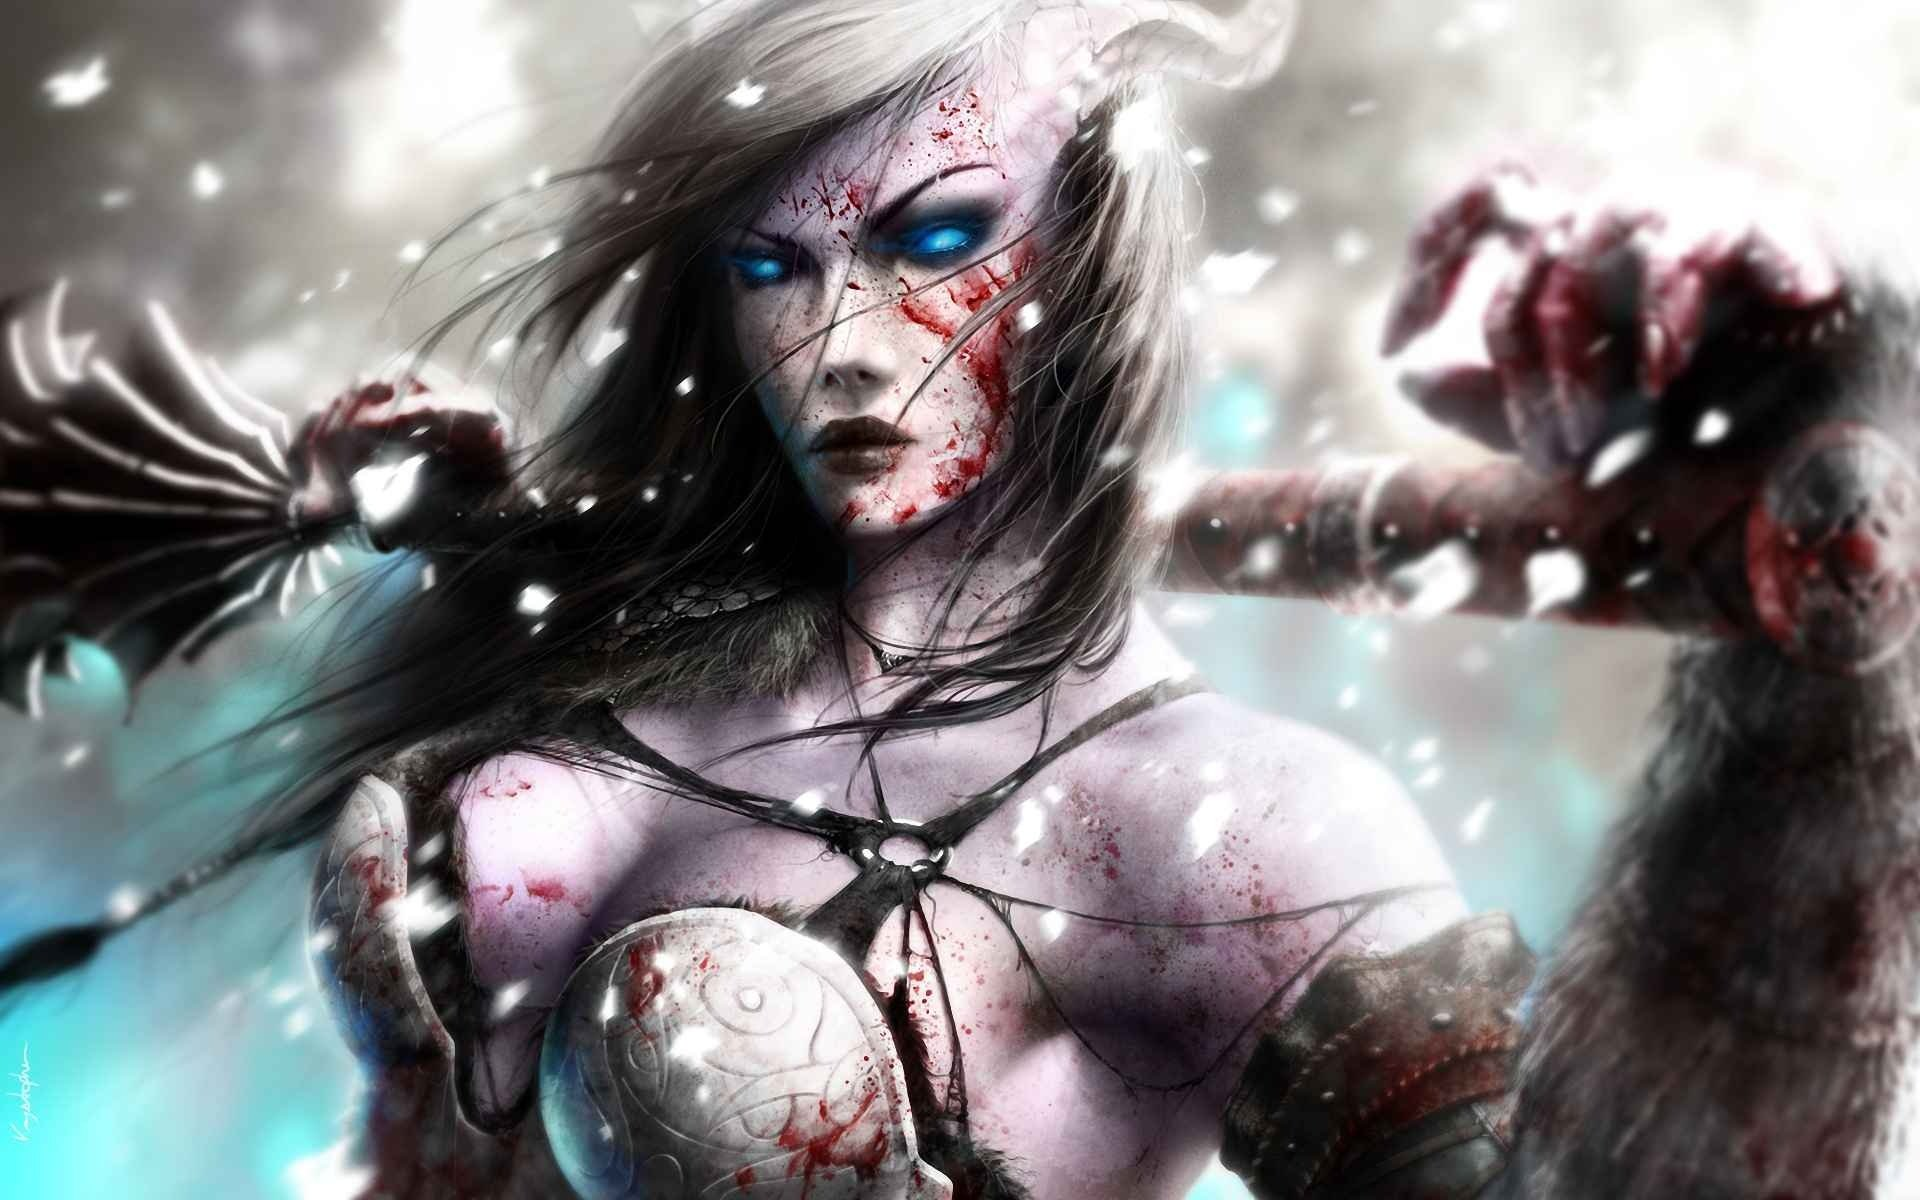 Draenei warrior female art porn image